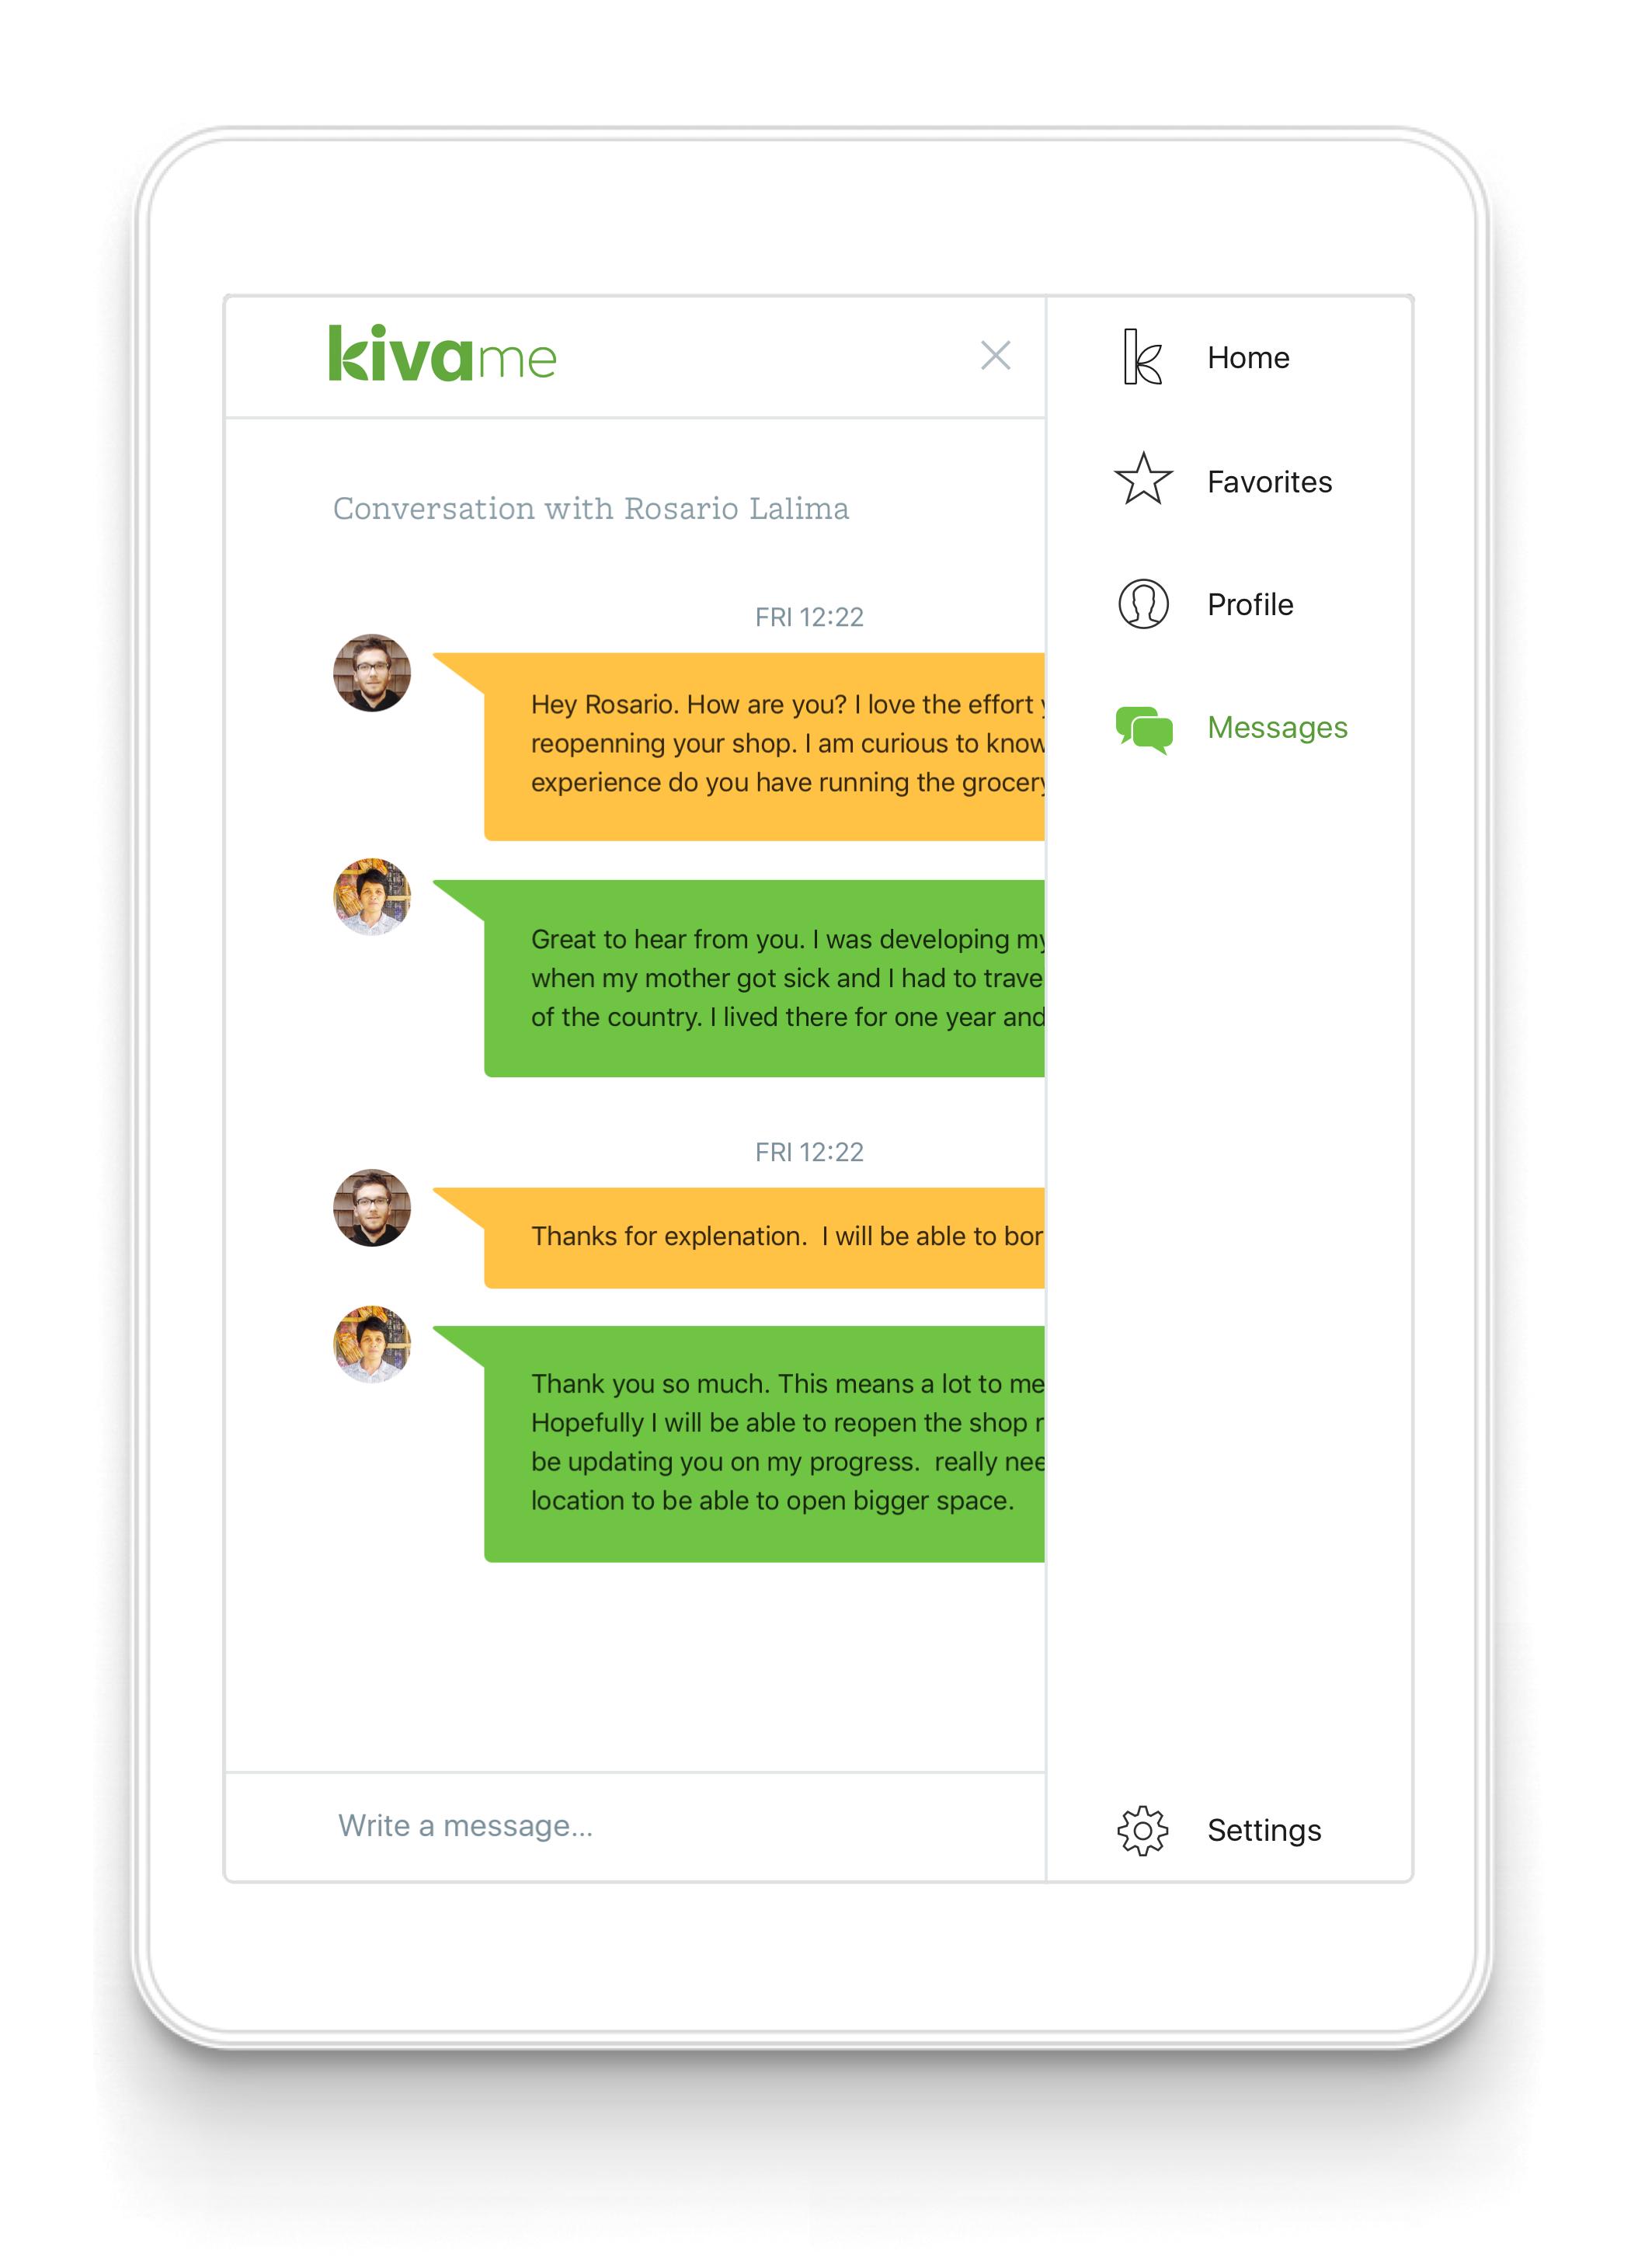 iPad-KivaMe-message3-2.png